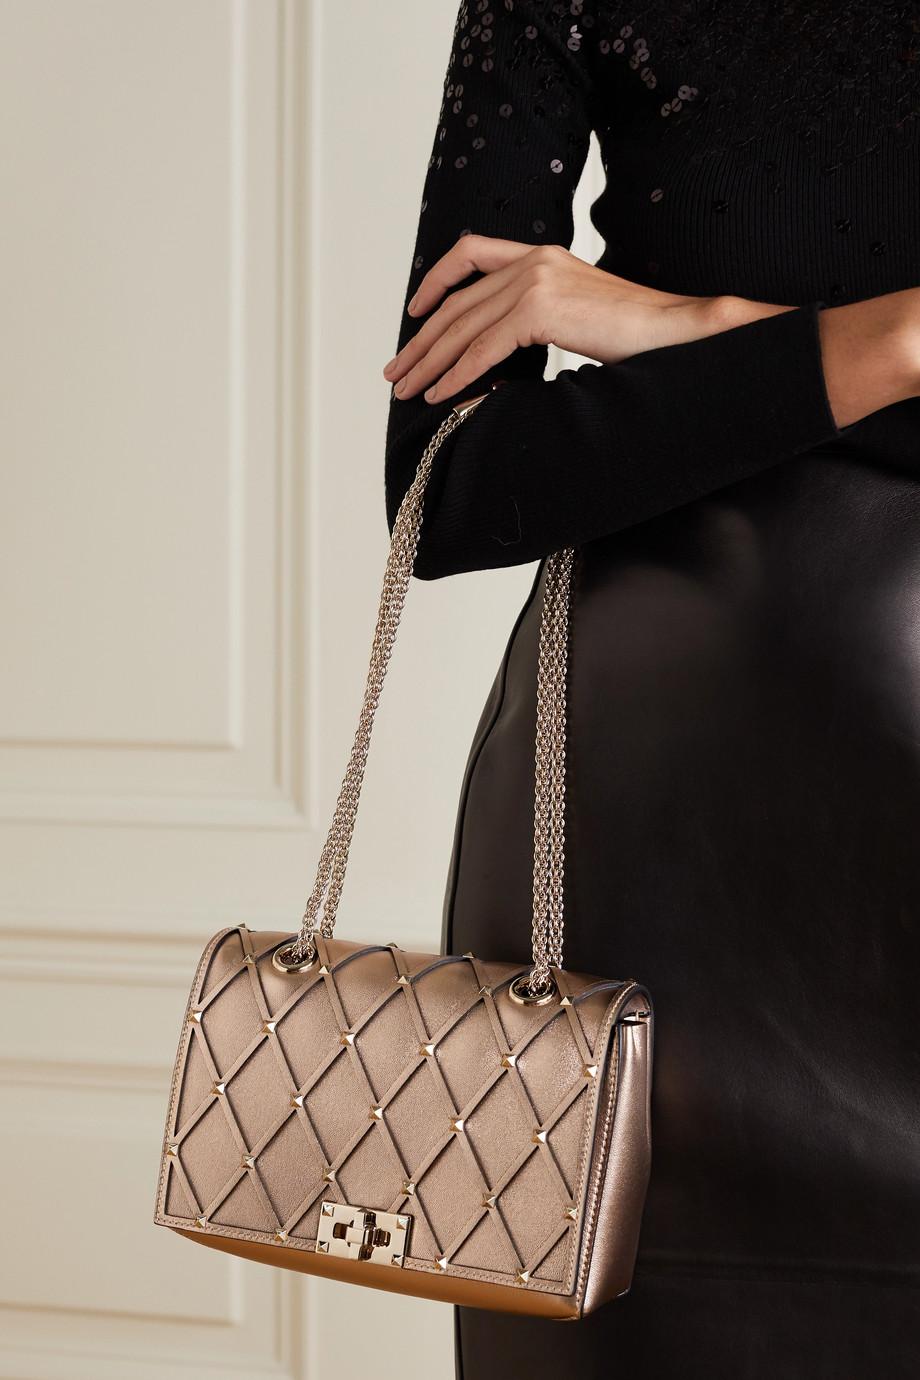 Valentino Valentino Garavani Beehive studded metallic leather shoulder bag